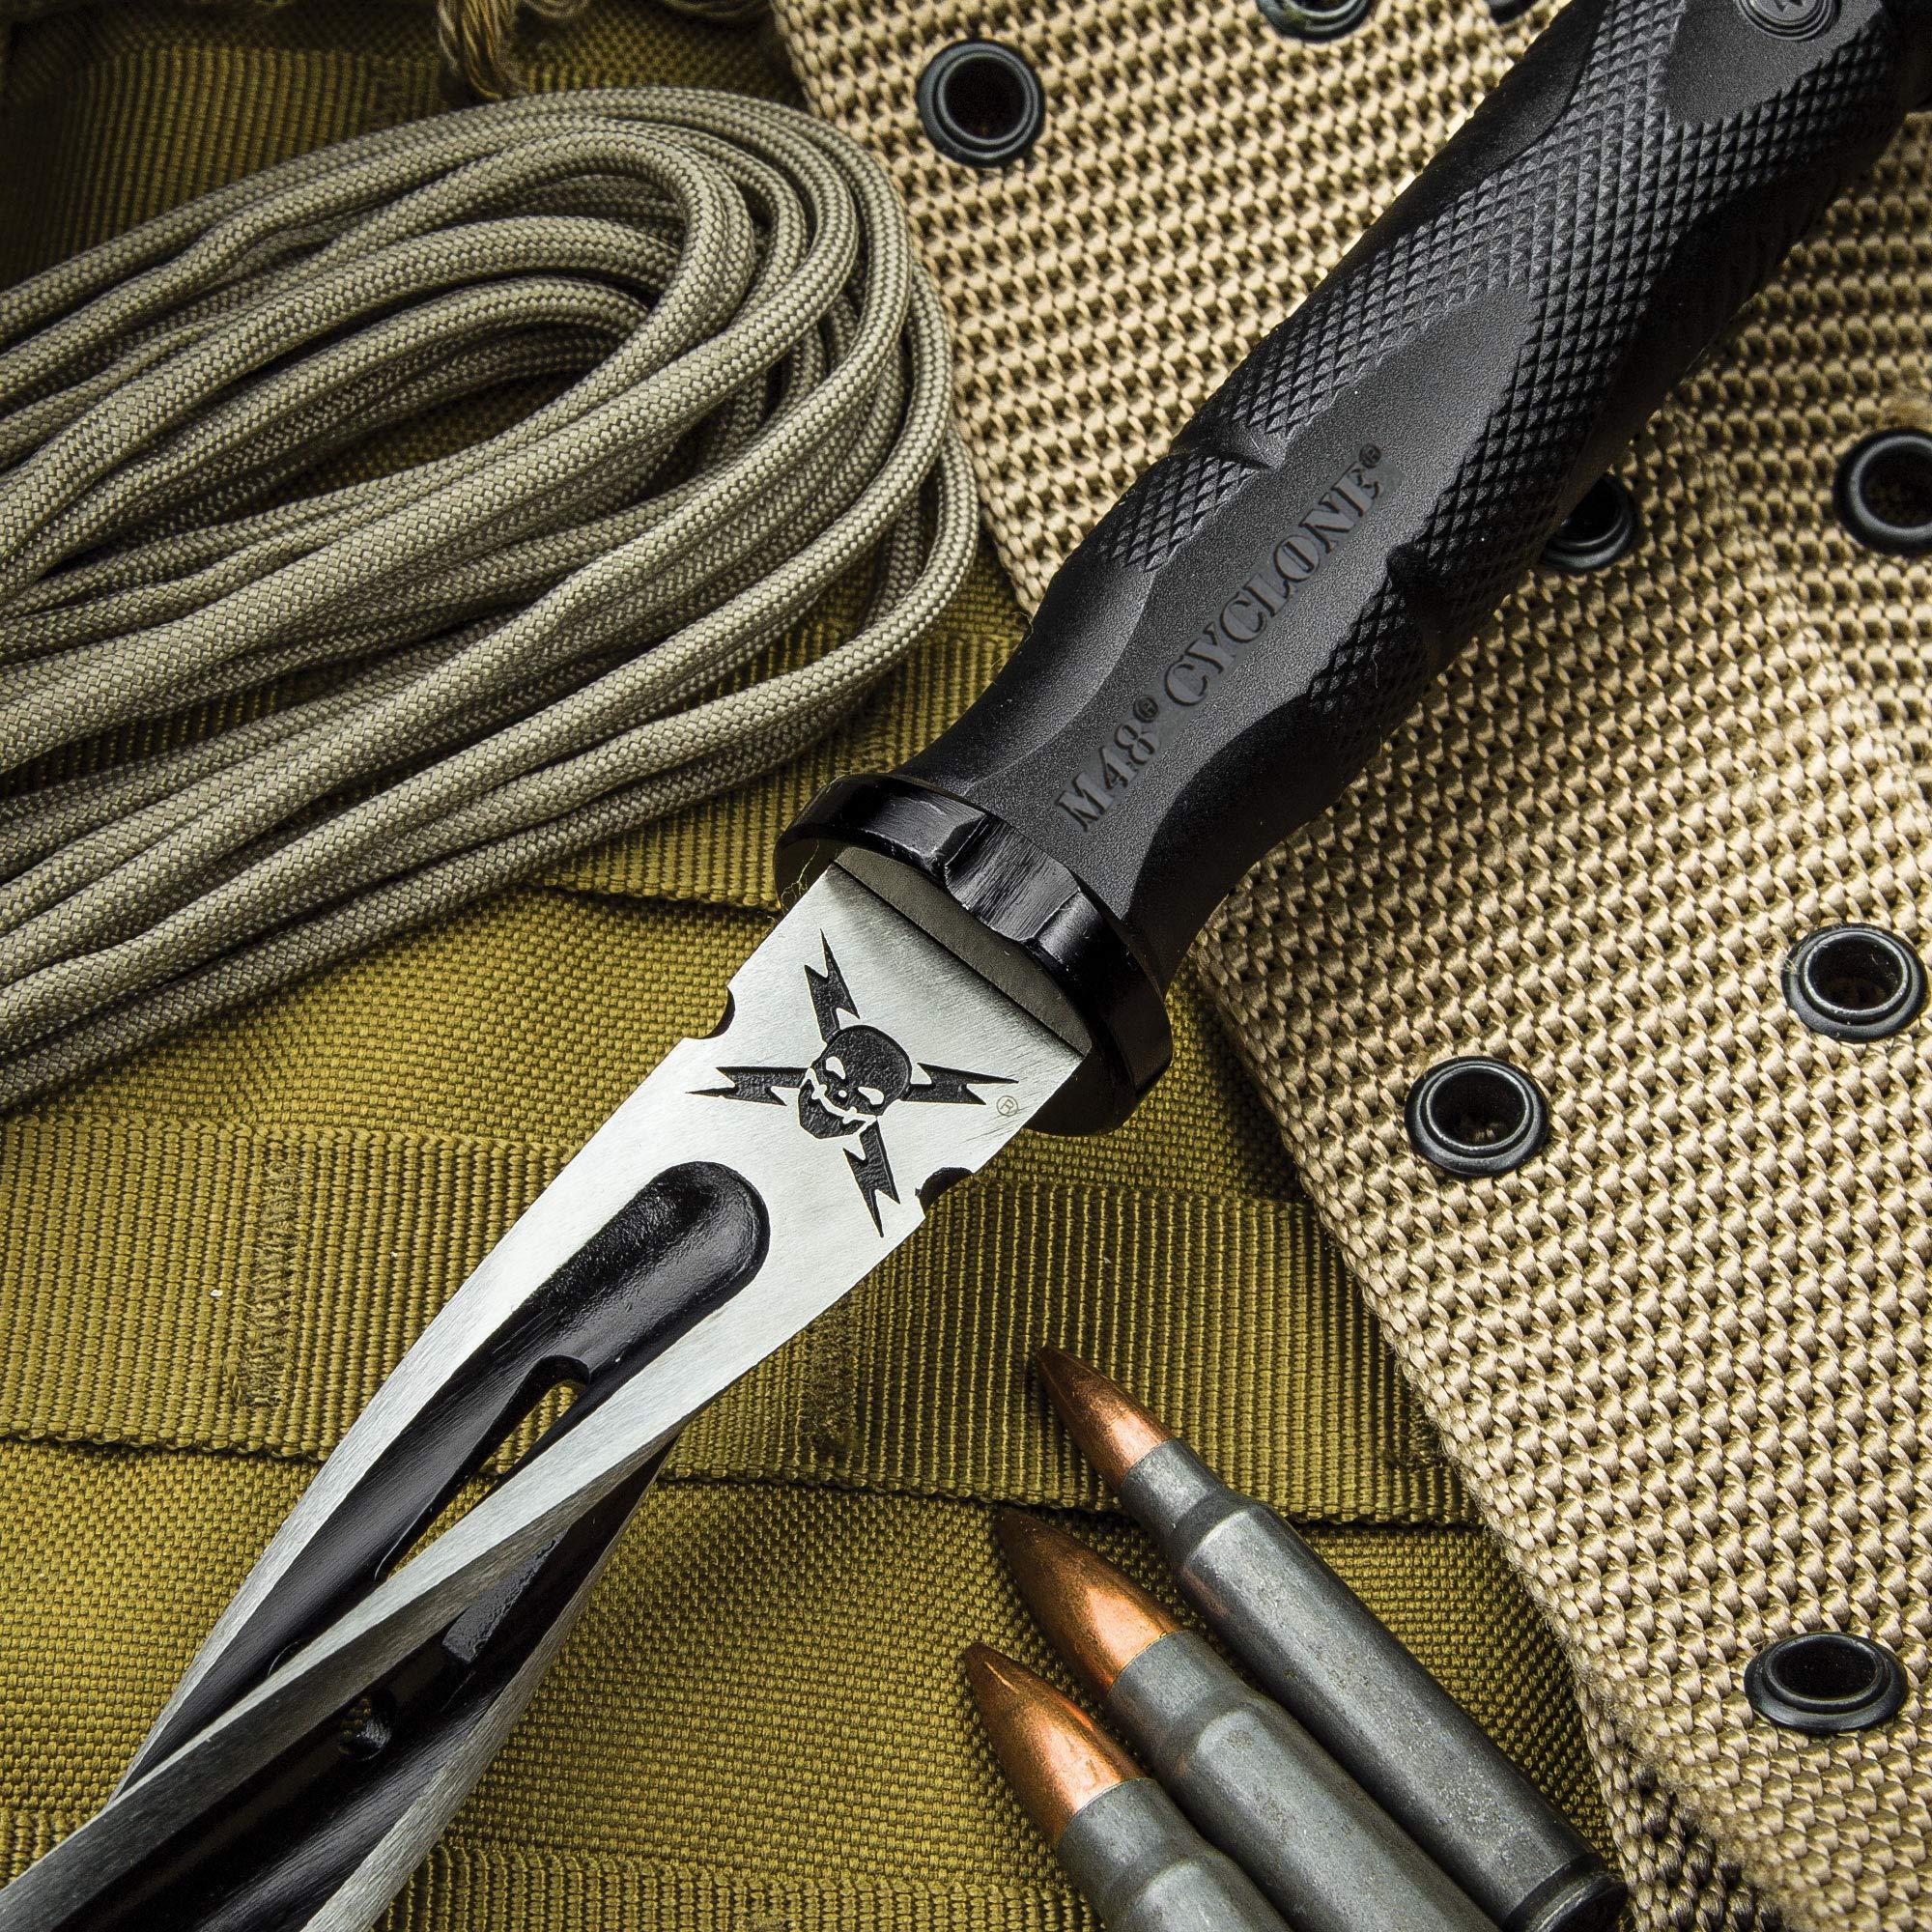 M48 Cyclone Tri-Edged Spiraling Dagger Knife With Custom Vortec Sheath by United Cutlery (Image #4)